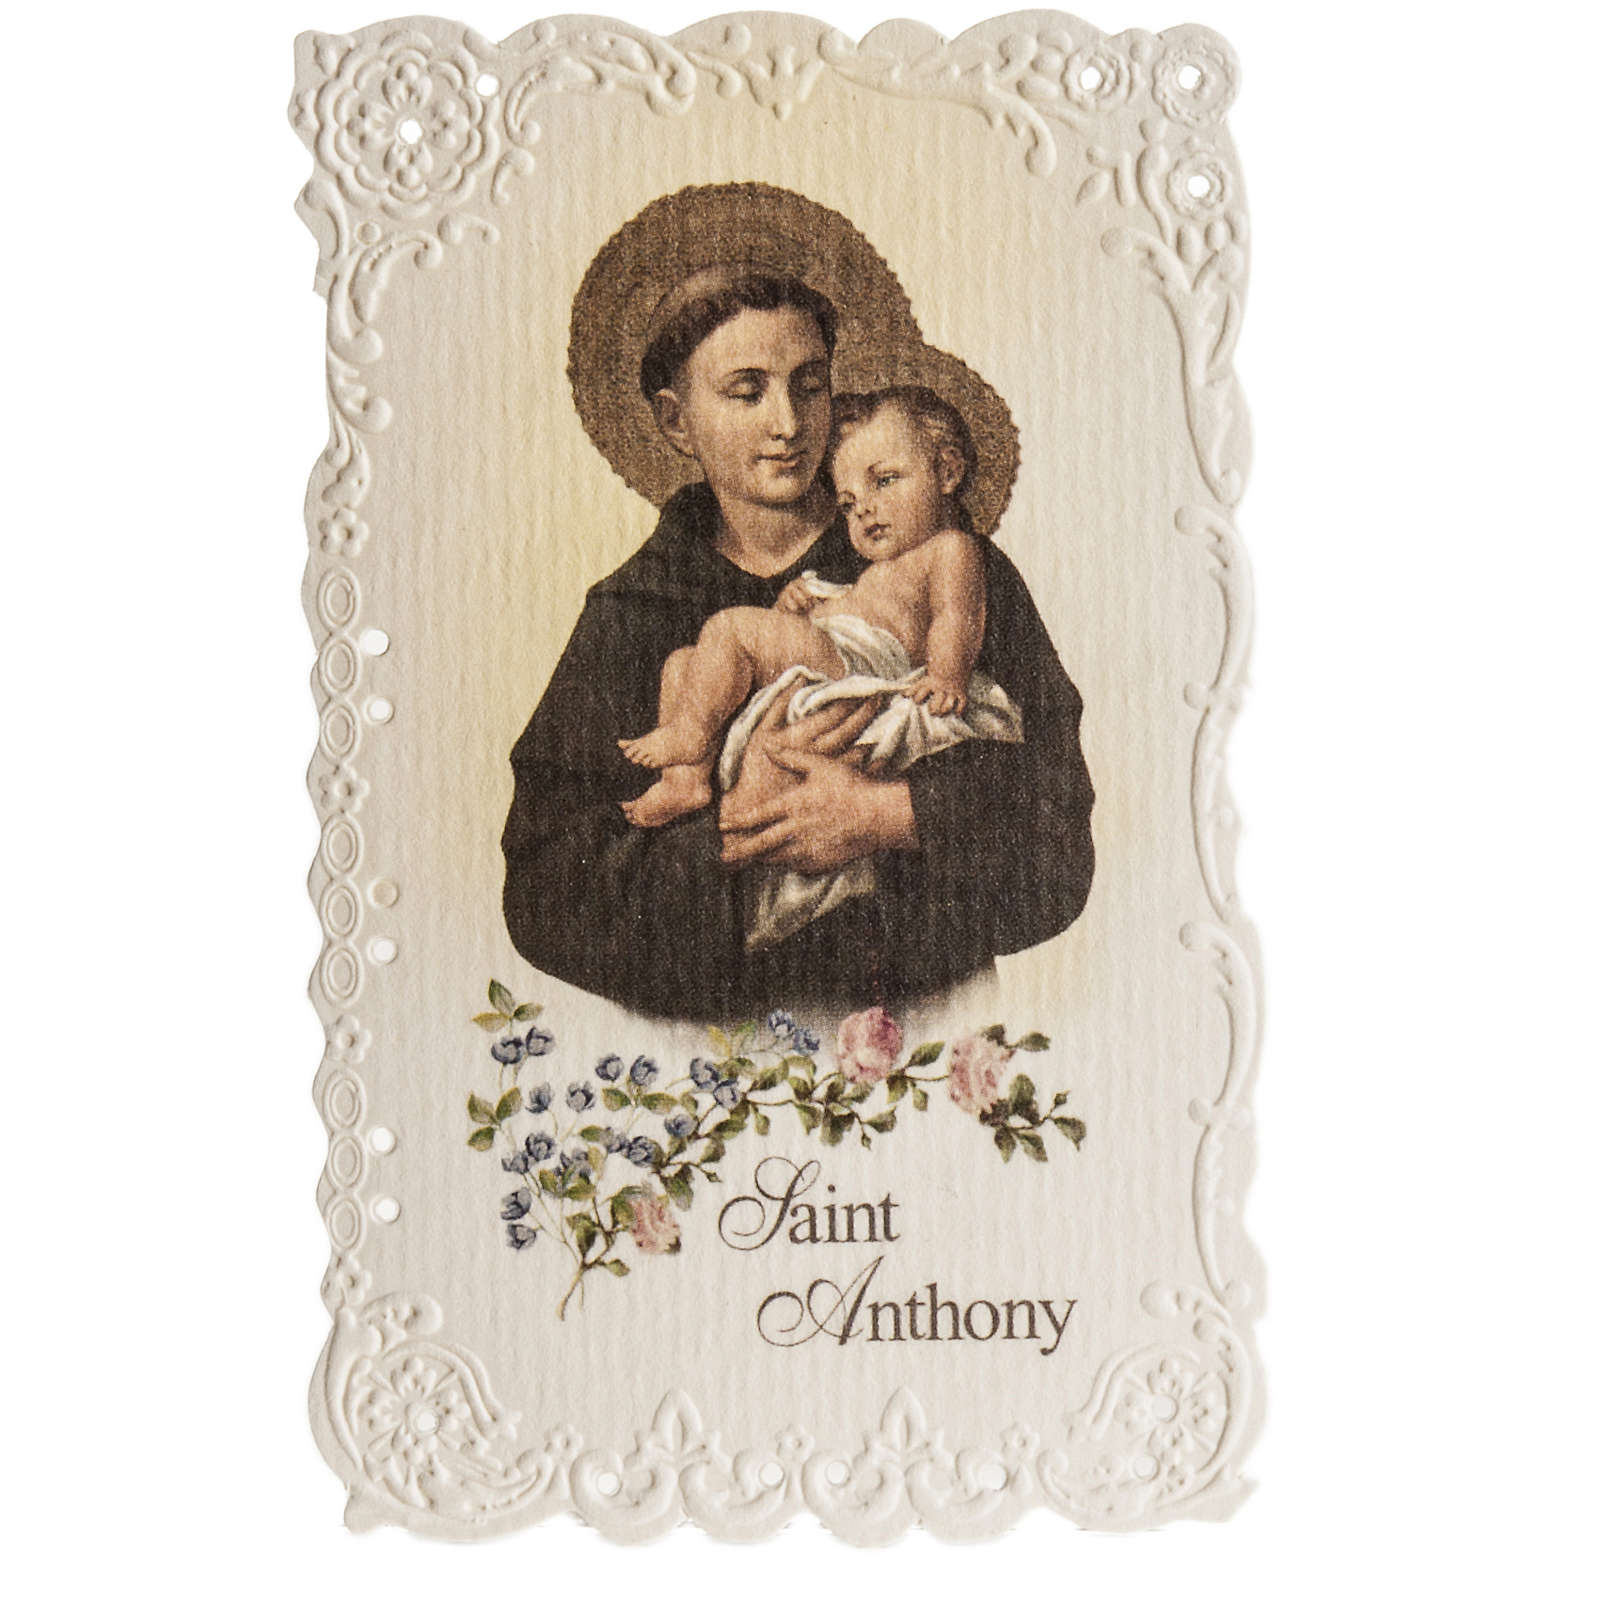 Santino Saint Anthony con preghiera (inglese) 4